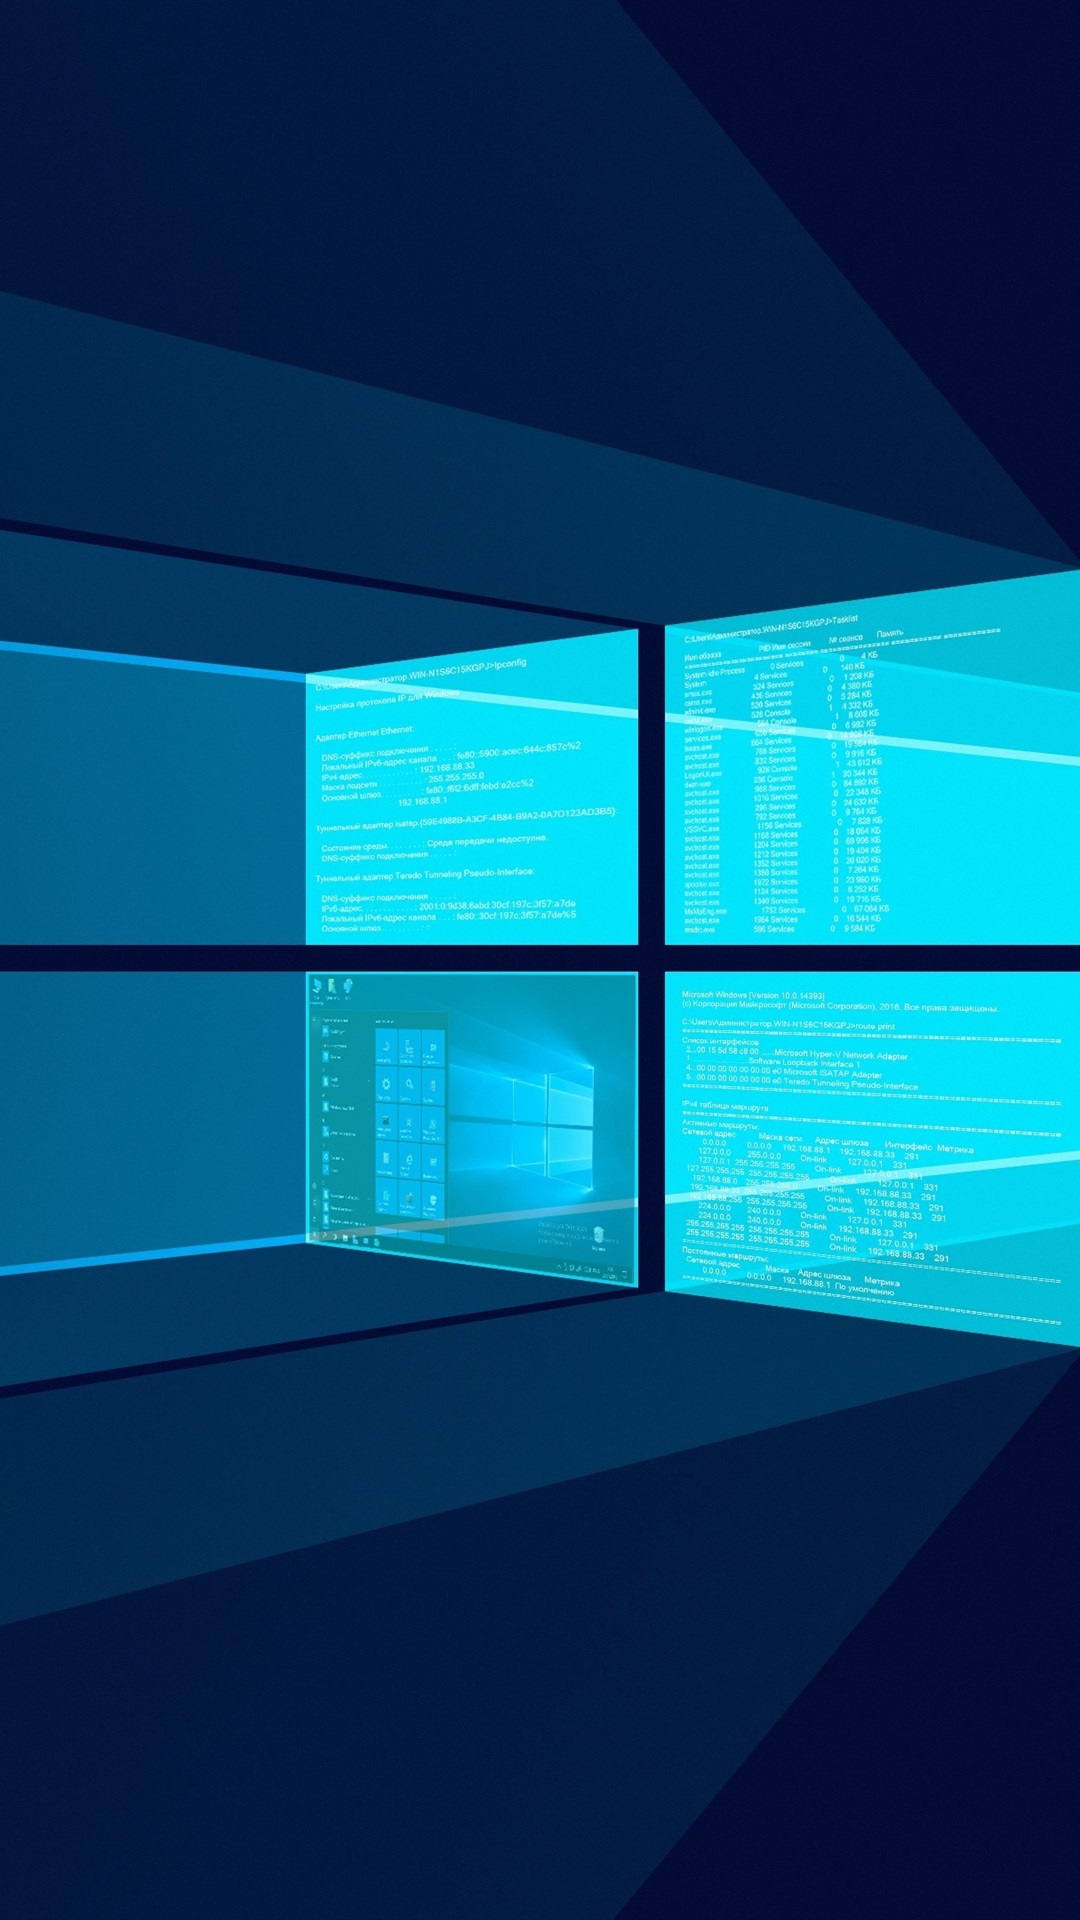 Windows 10 Bildschirm Kreativ 1080x1920 Iphone 8 7 6 6s